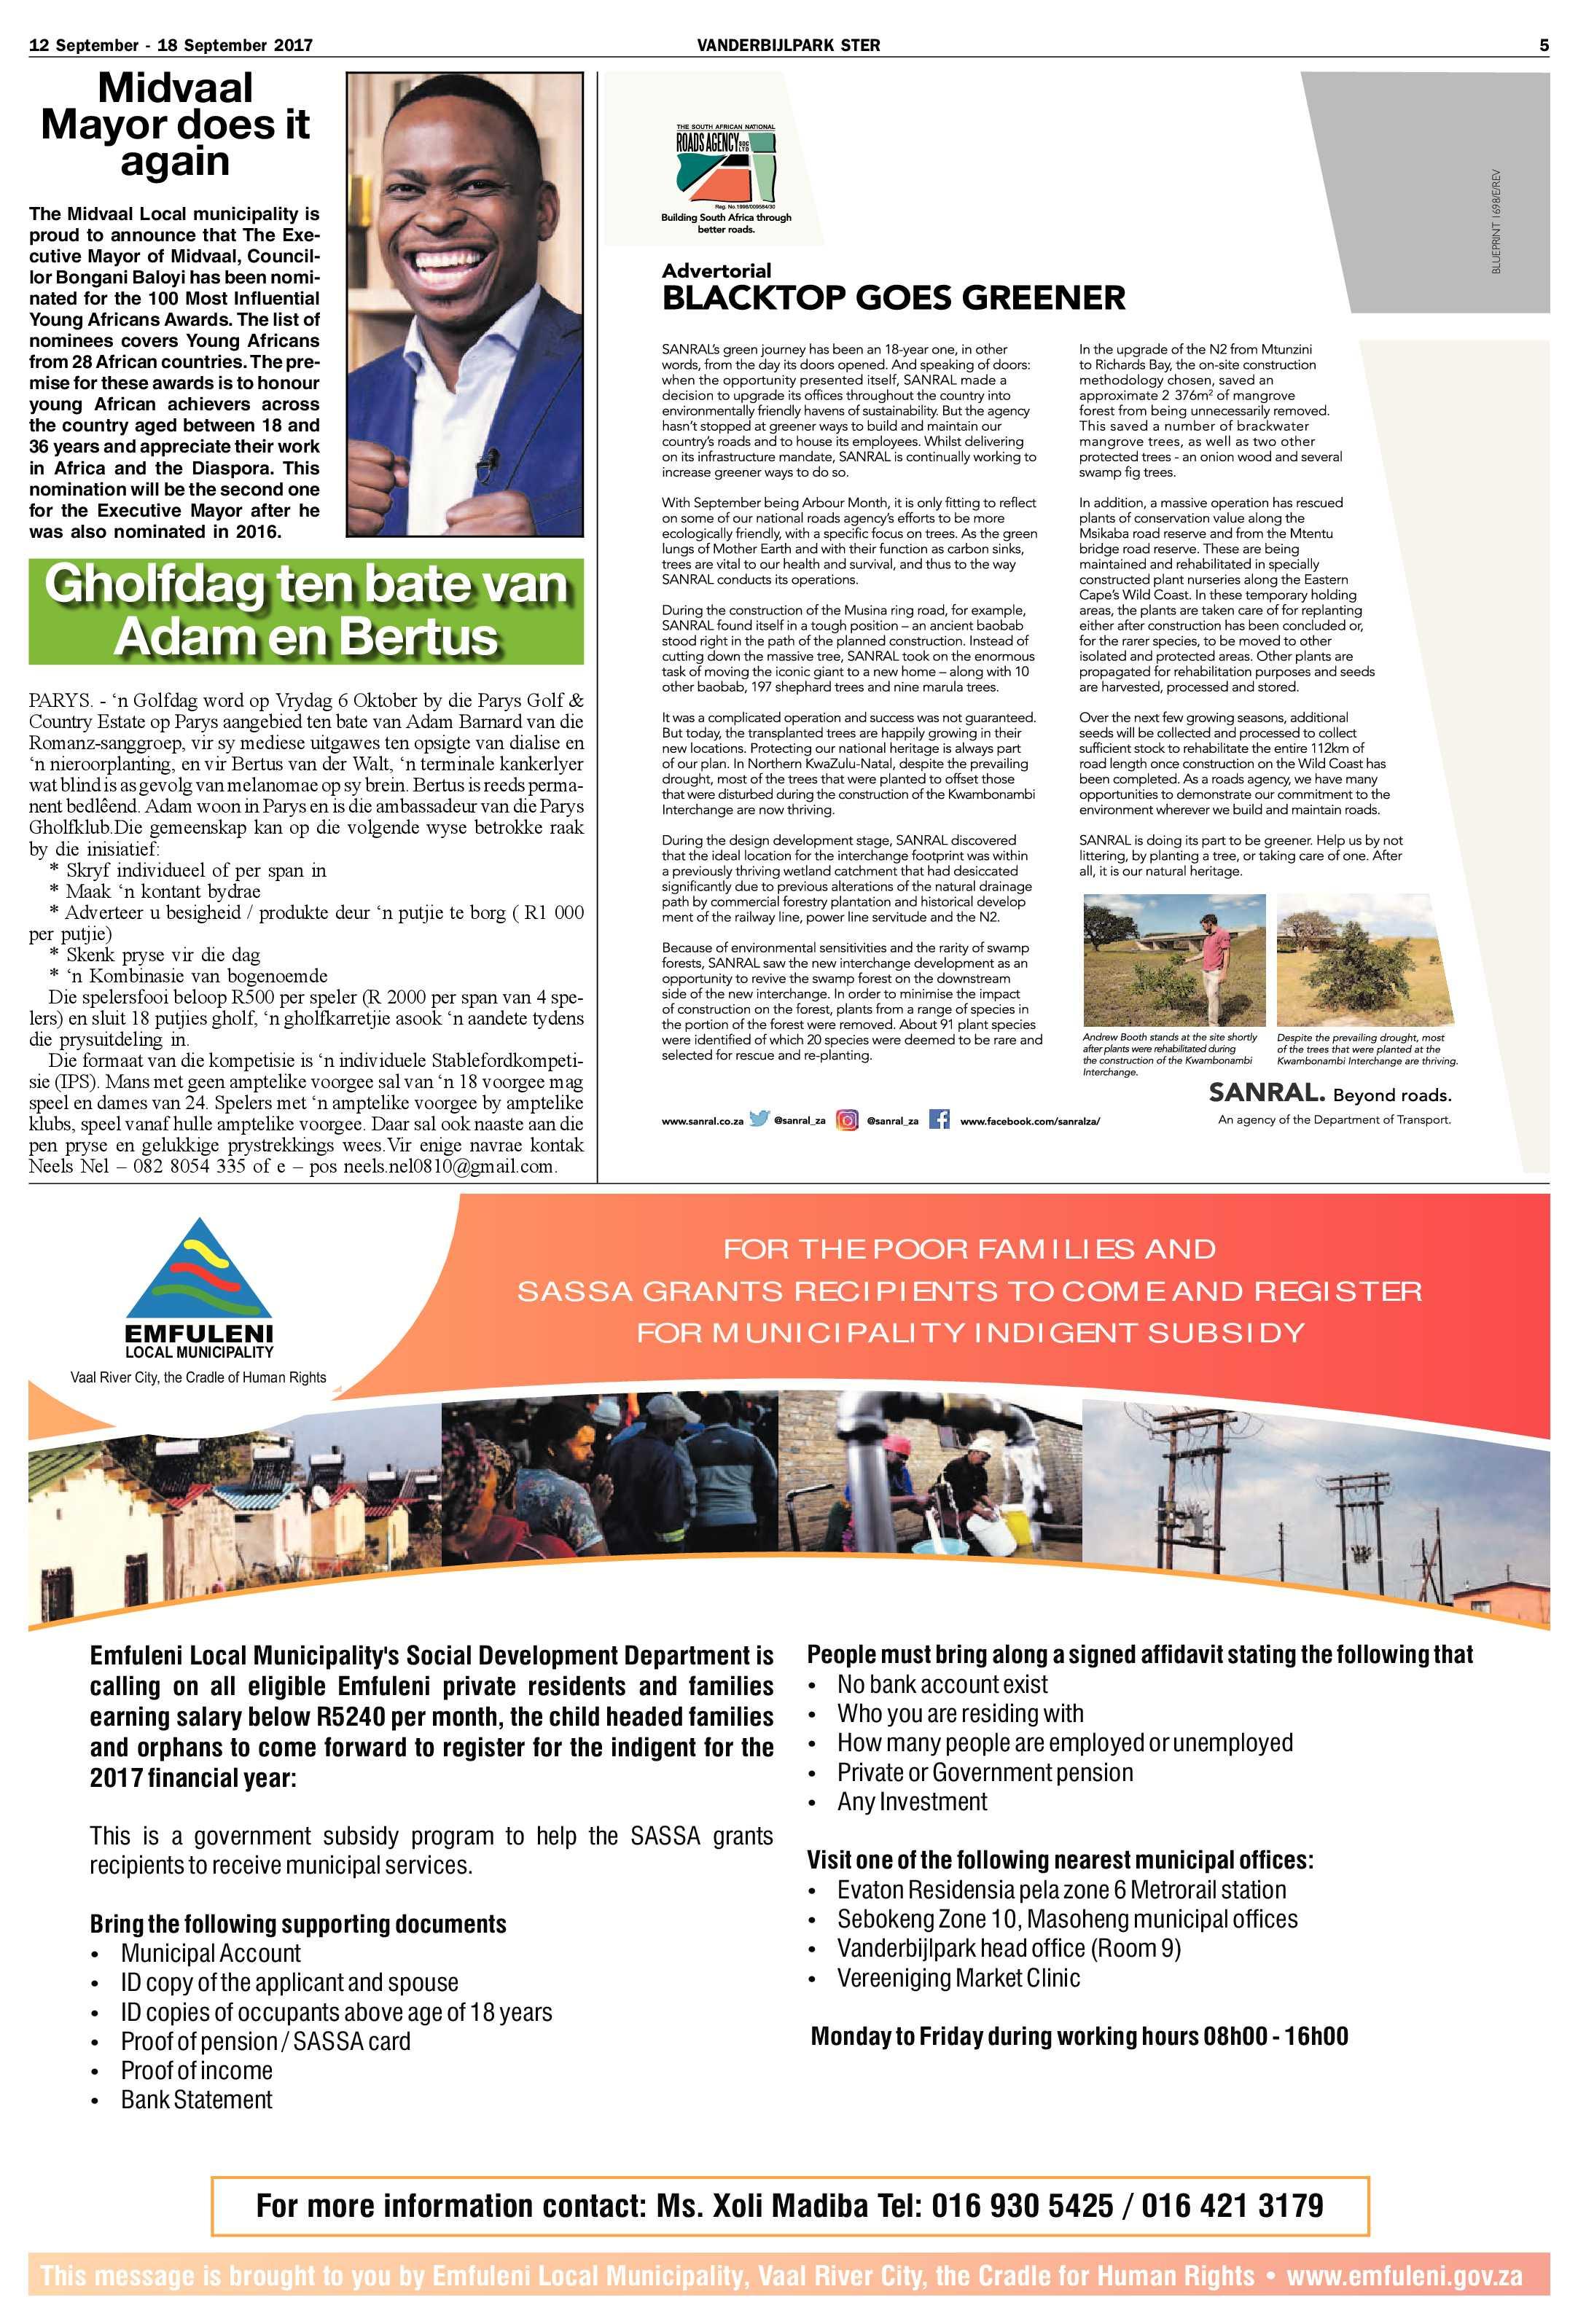 vanderbijlpark-ster-12-18-september-2017-epapers-page-5